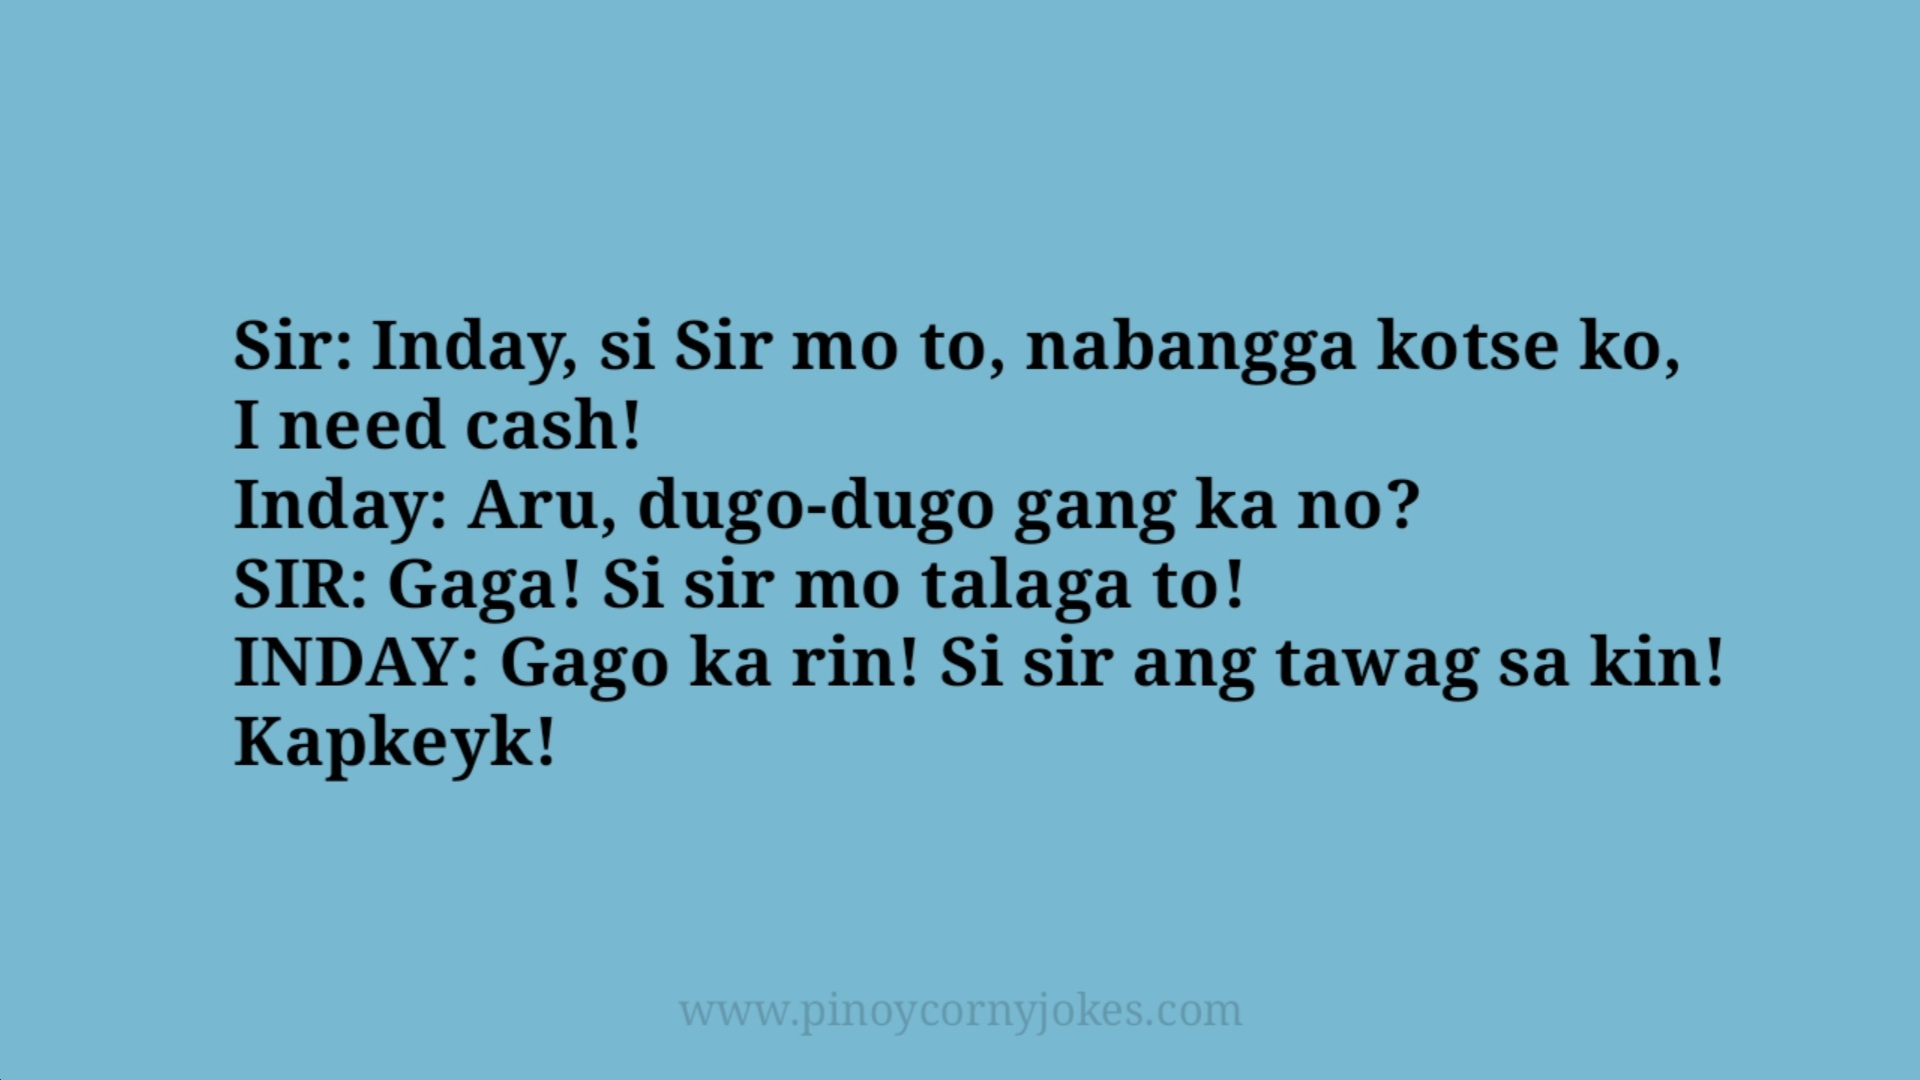 nabangga kotse best katulong jokes pinoy